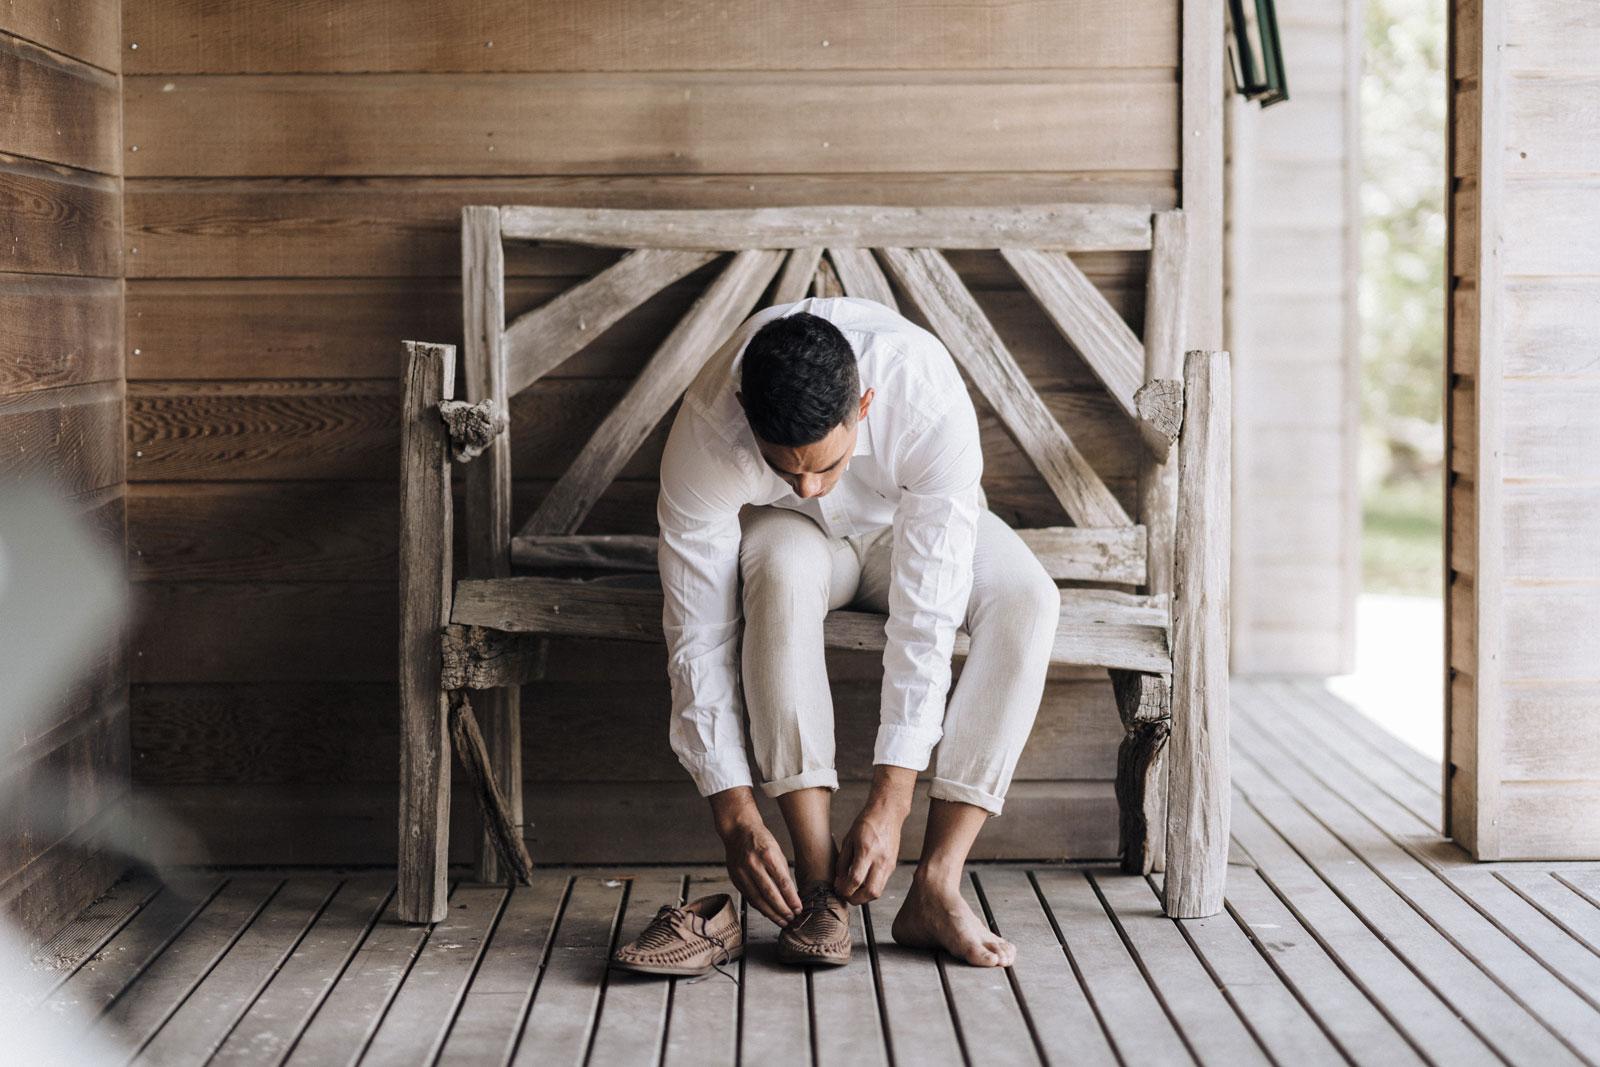 newfound-n-w-black-barn-tarawera-rotorua-wedding-photographer-46